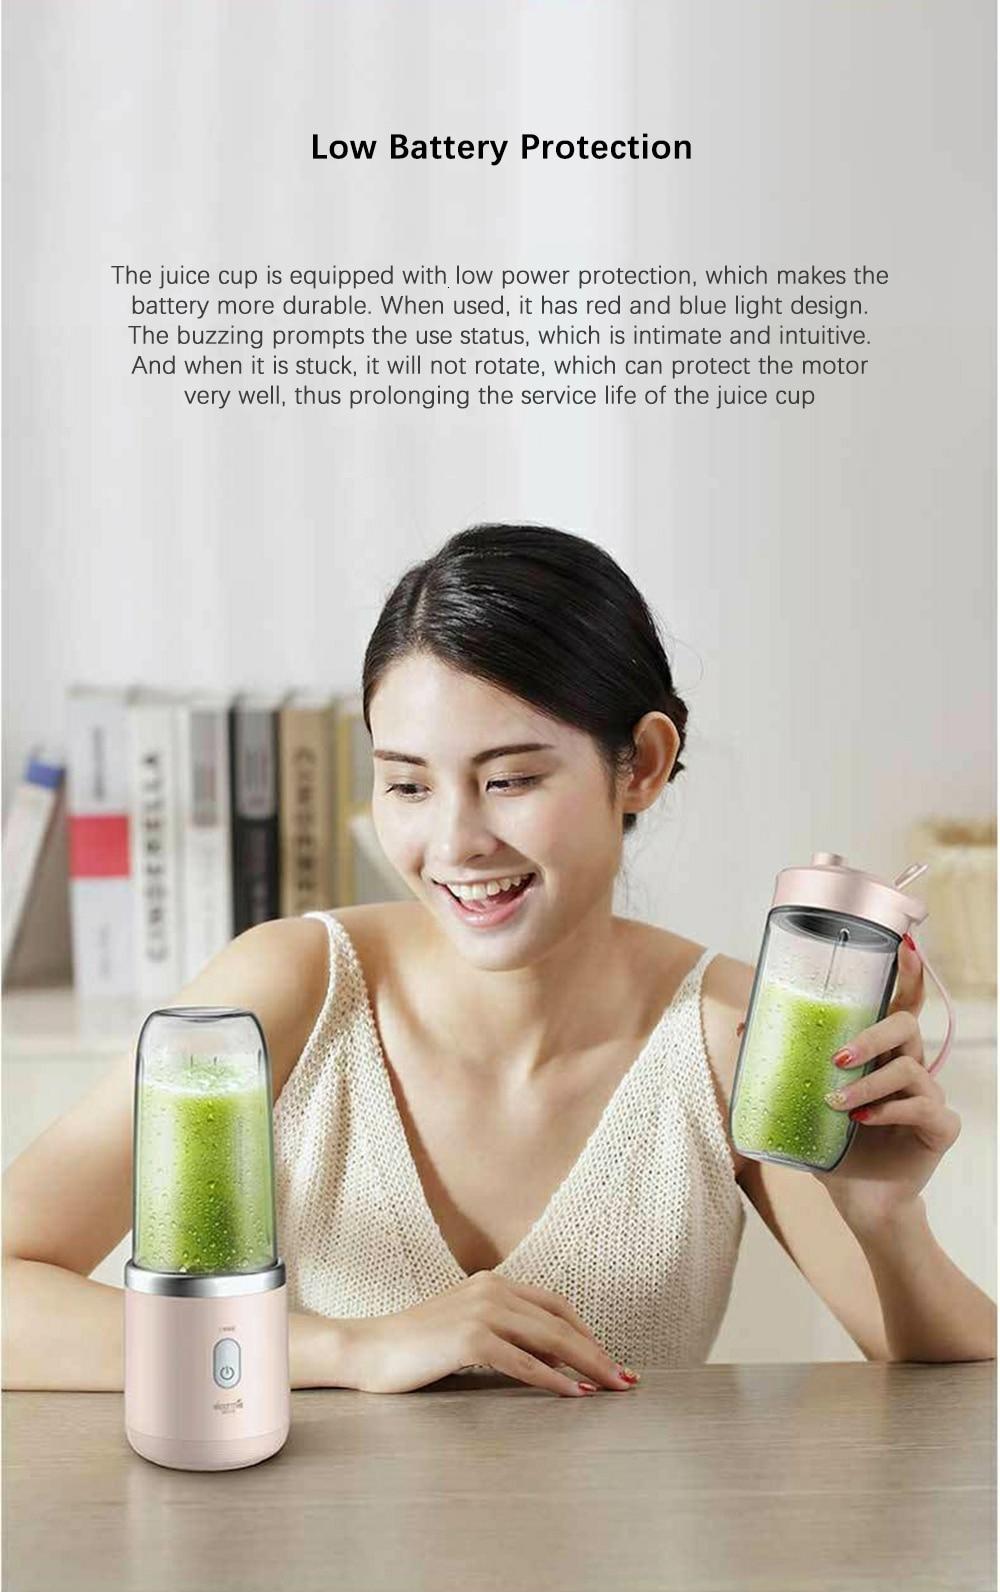 Hfad2ccd7e1ab4a9db2c59d66d4d5cb91M Xiaomi Deerma Portable Blender Electric Juicer 400ML Wireless Automatic Multipurpose USB Rechargable Mini Juice Cup Cut Mixer